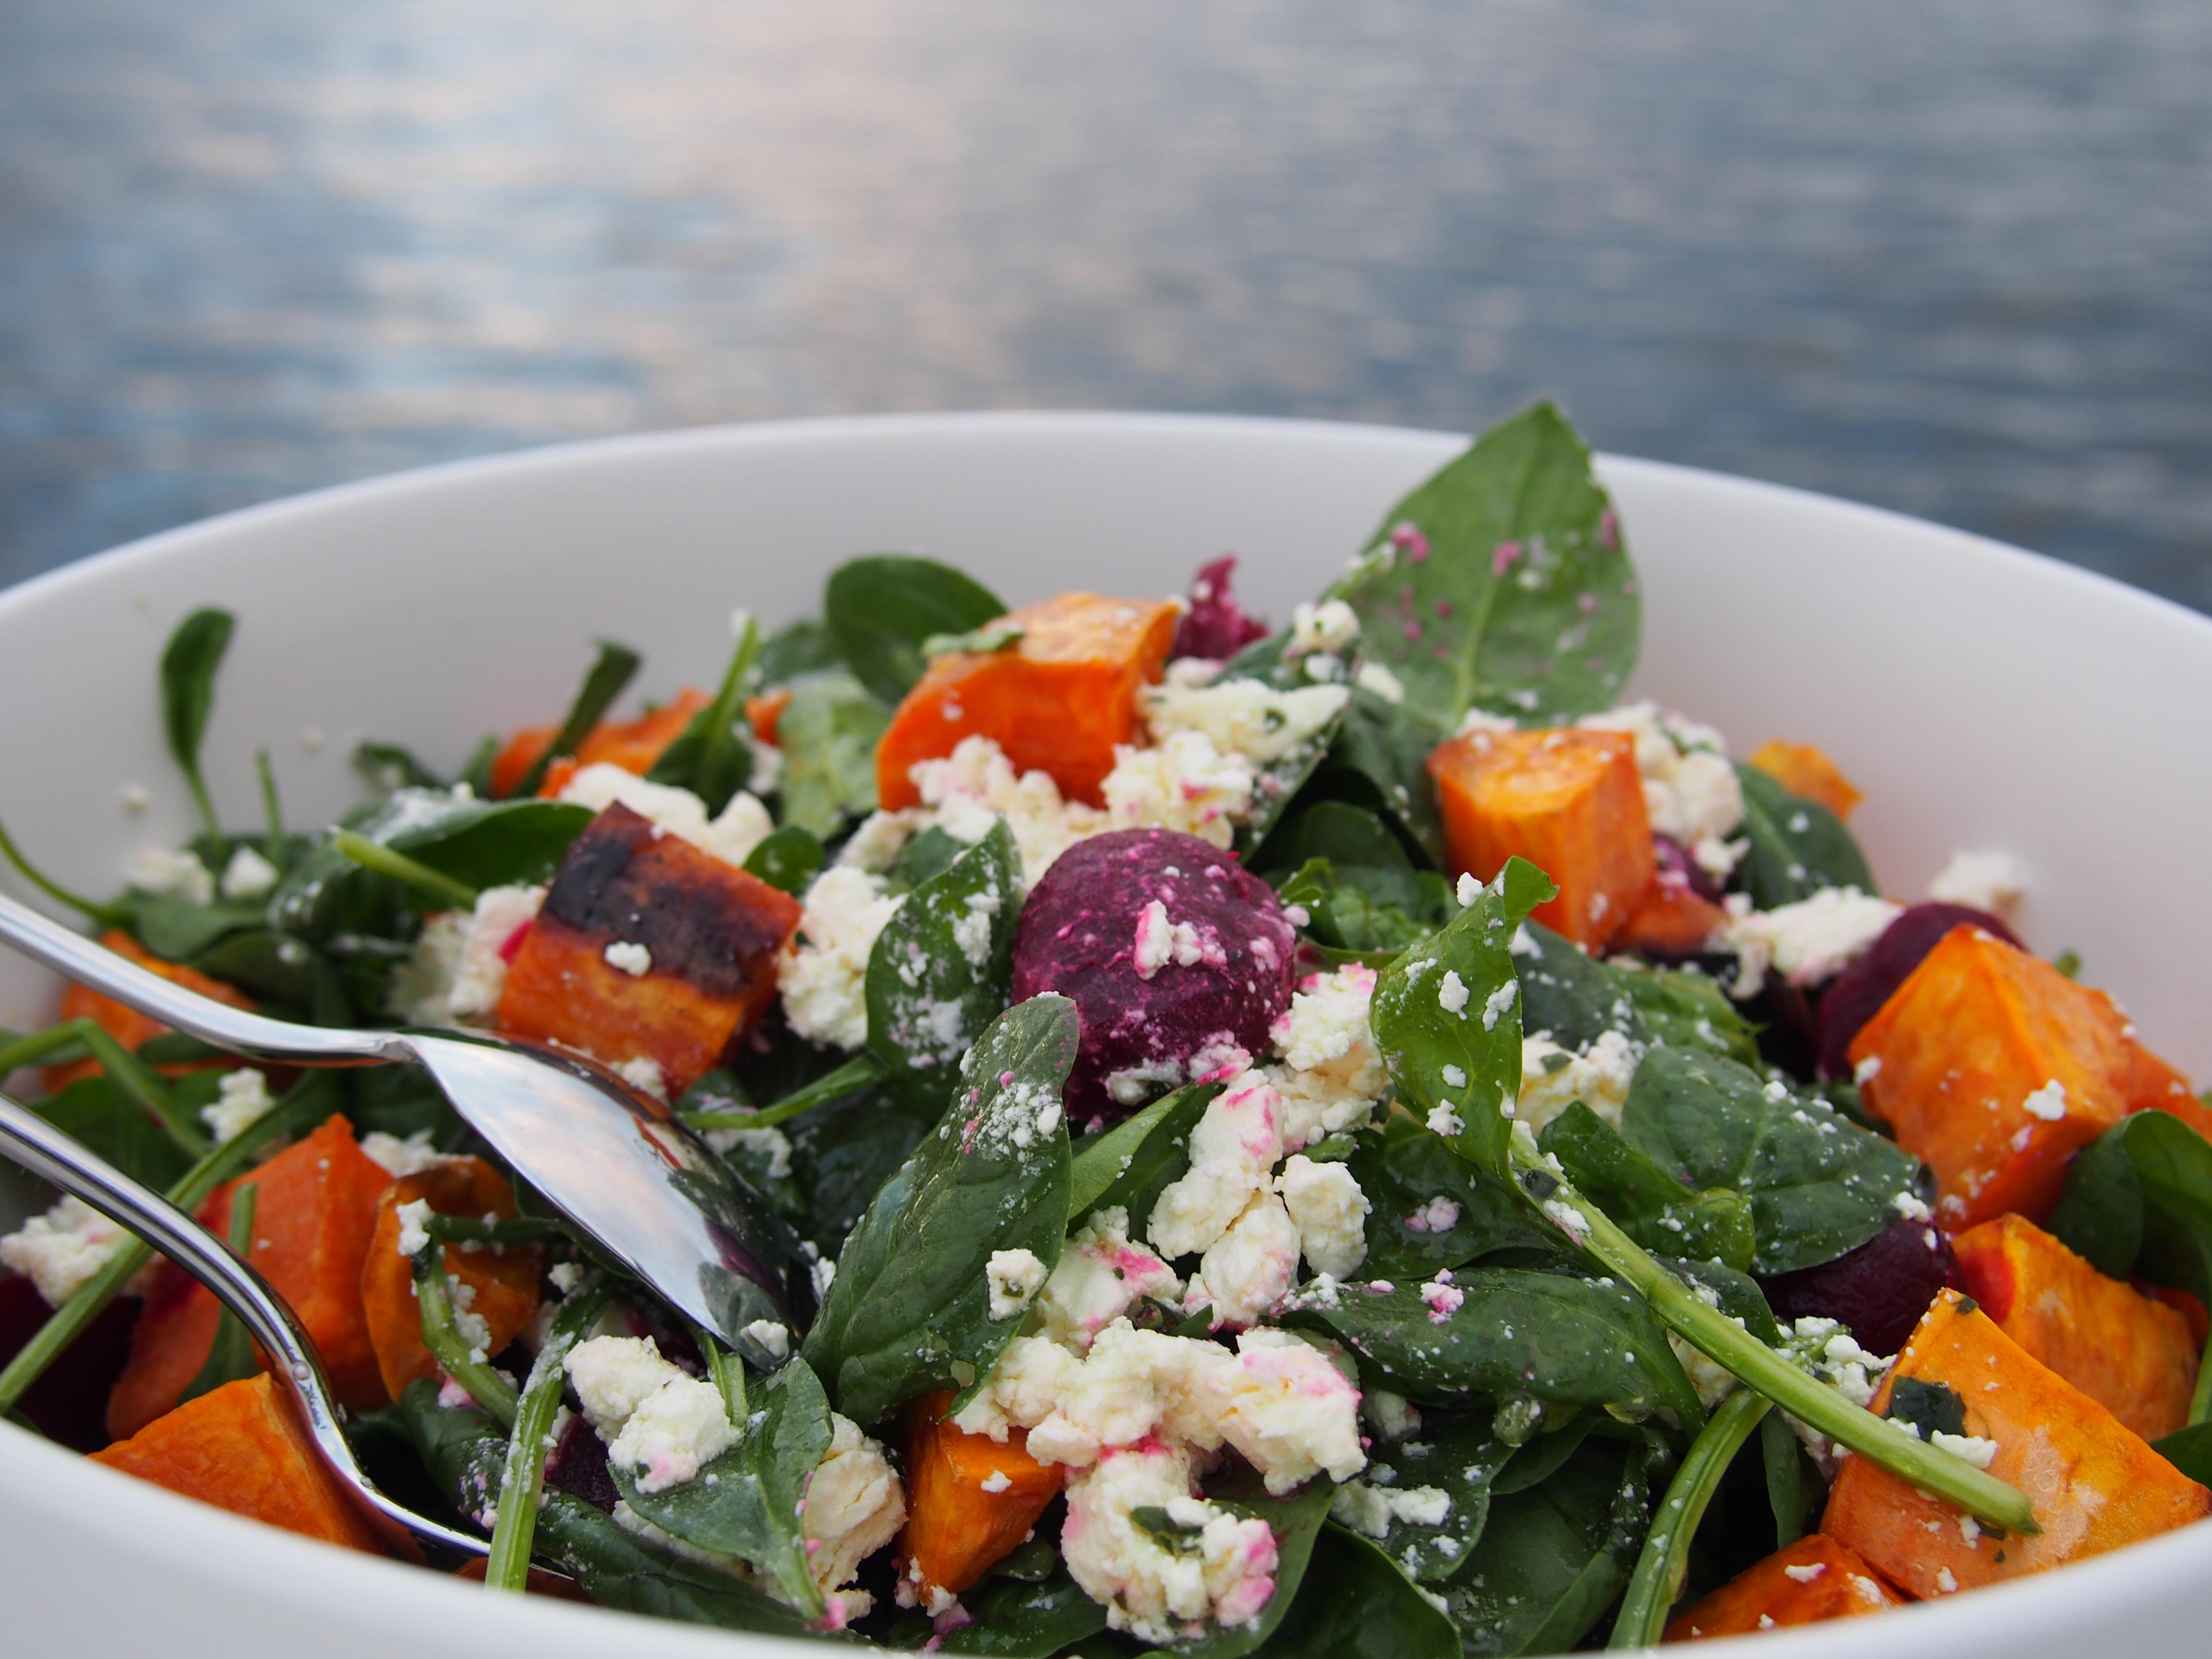 Roasted Beet And Sweet Potato Salad Recipes — Dishmaps